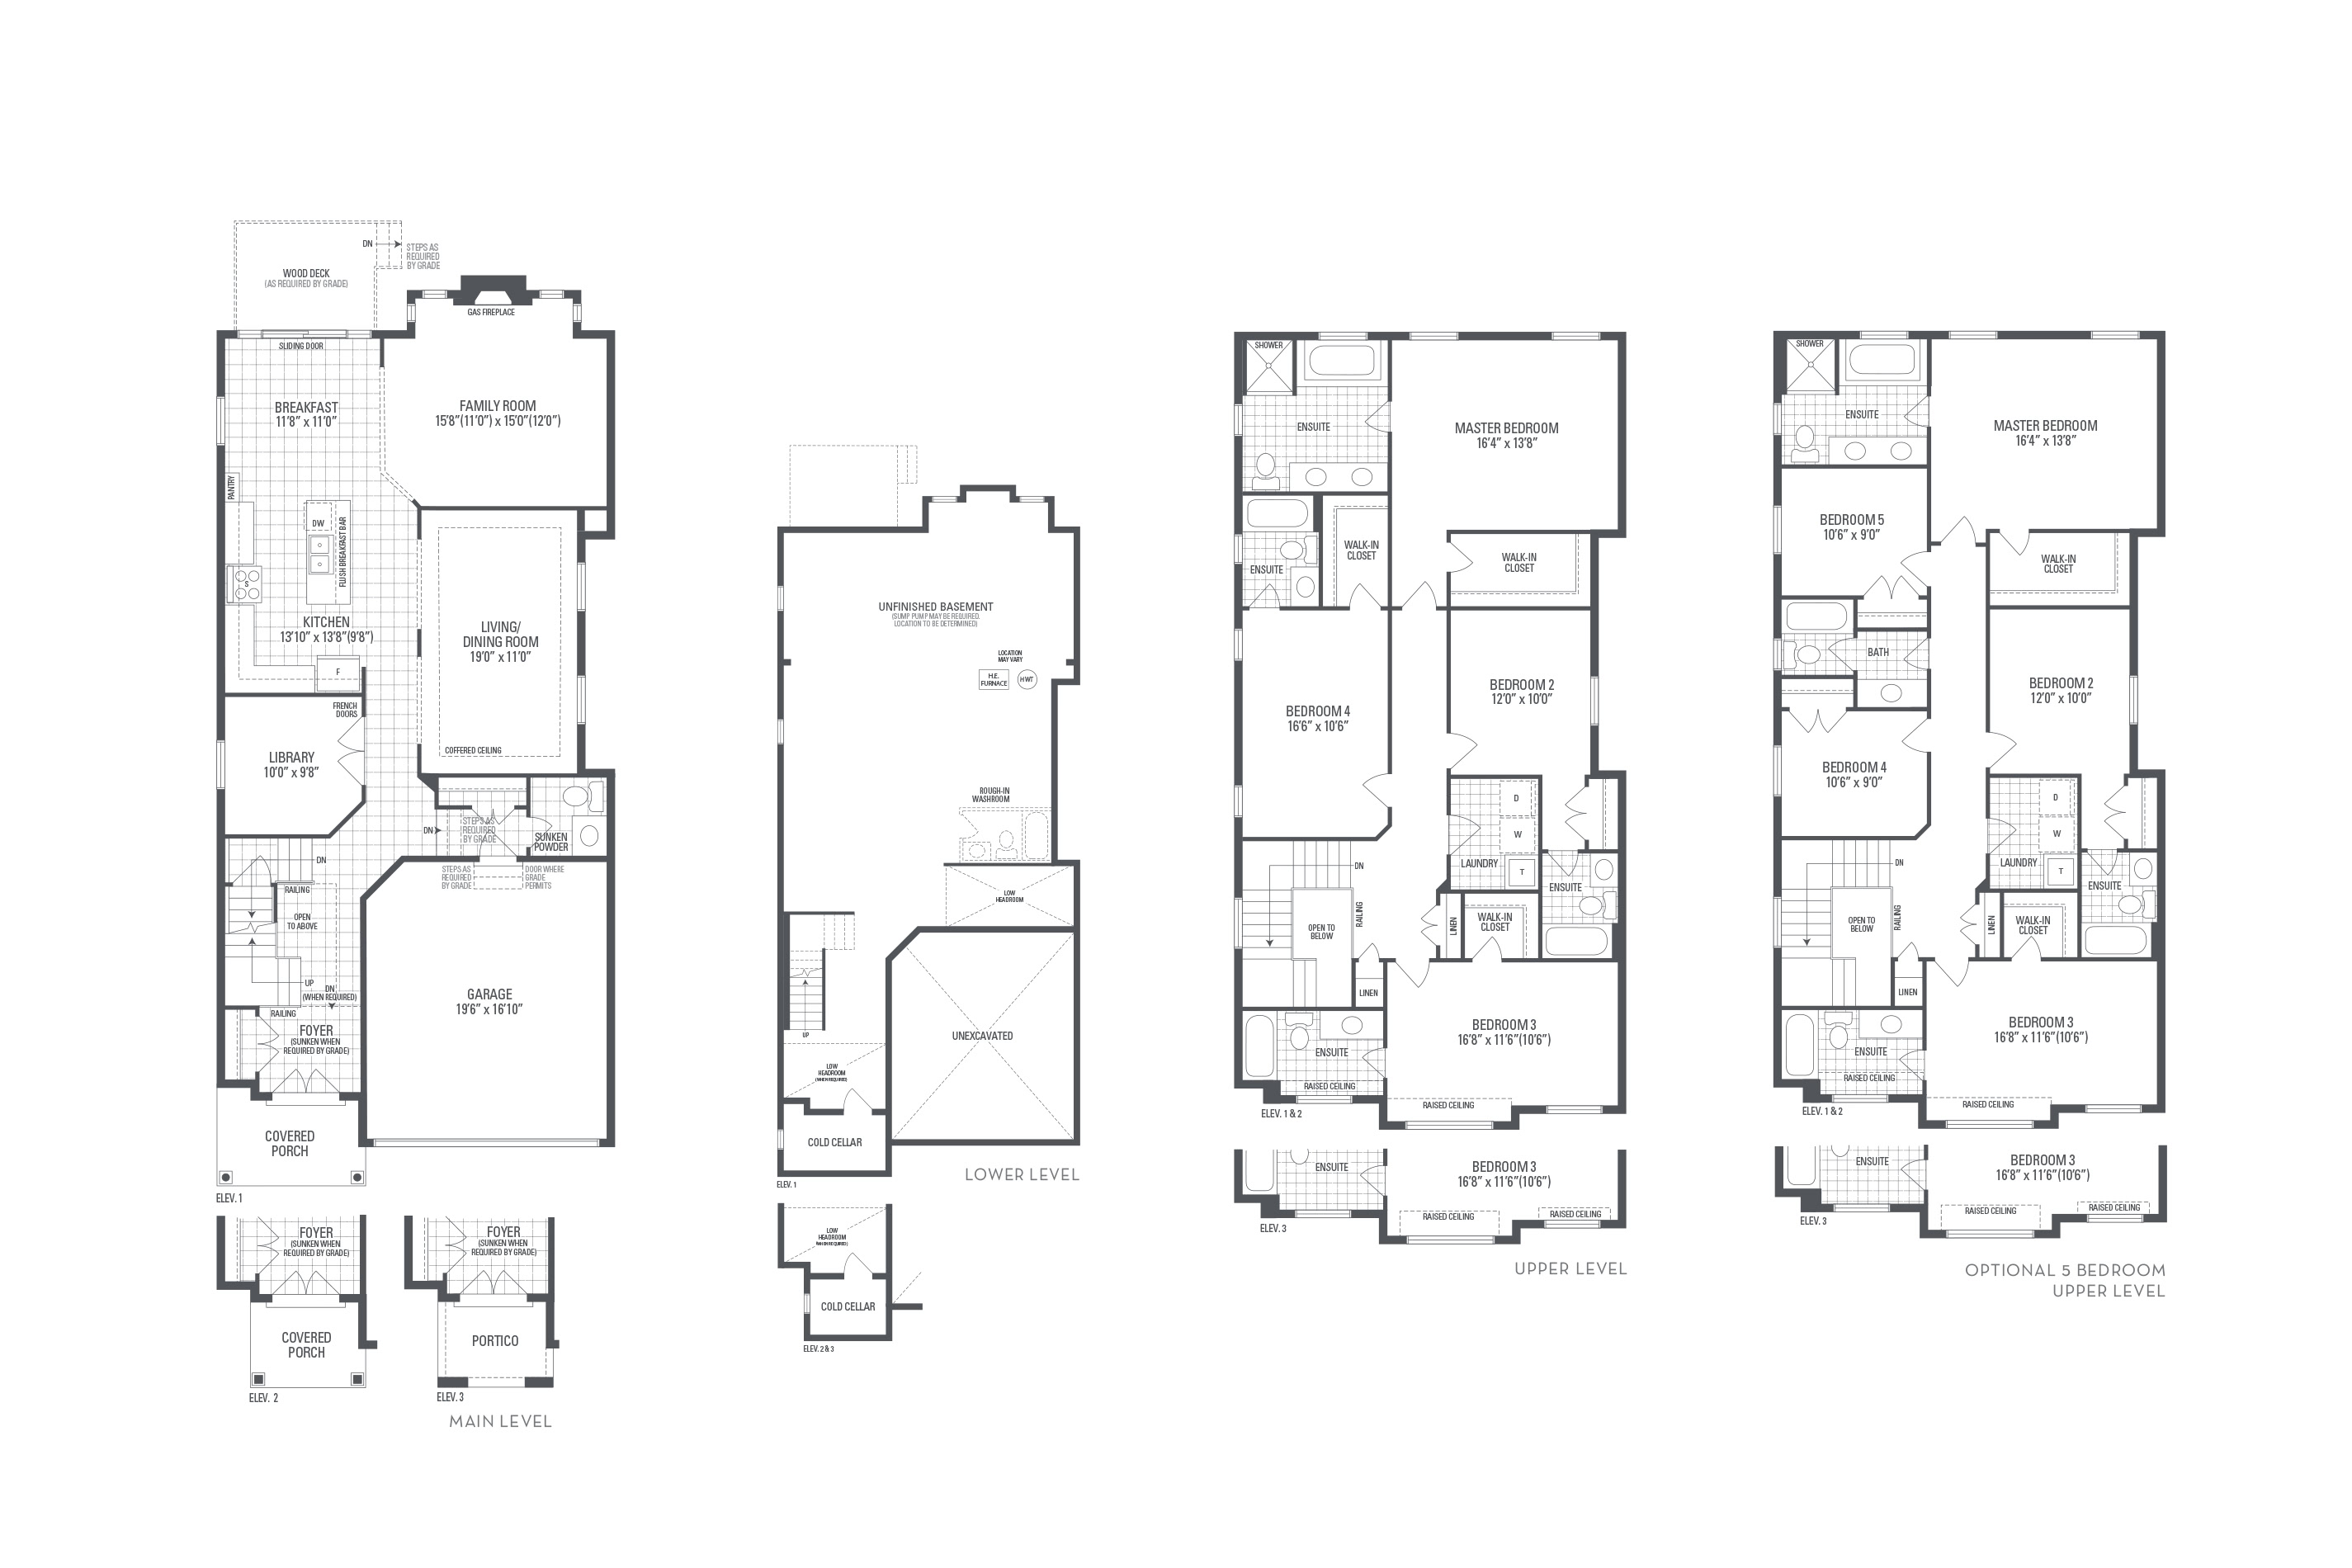 Bronte 09 Elev. 2 Floorplan Thumbnail